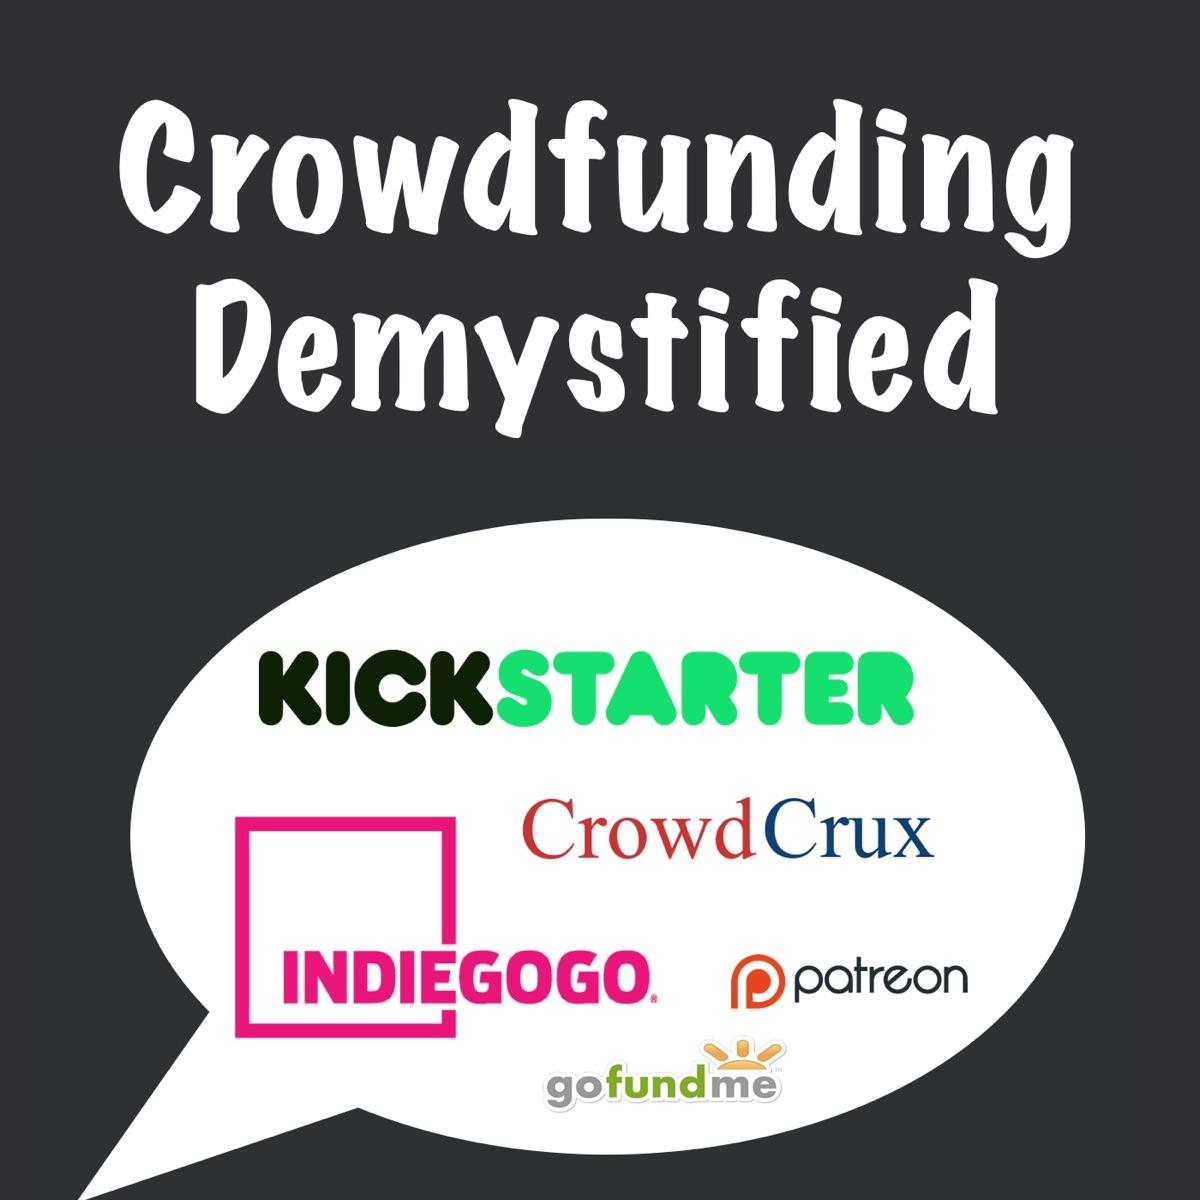 Crowdfunding: Kickstarter, Indiegogo, and Ecommerce with CrowdCrux | Crowdfunding Demystified